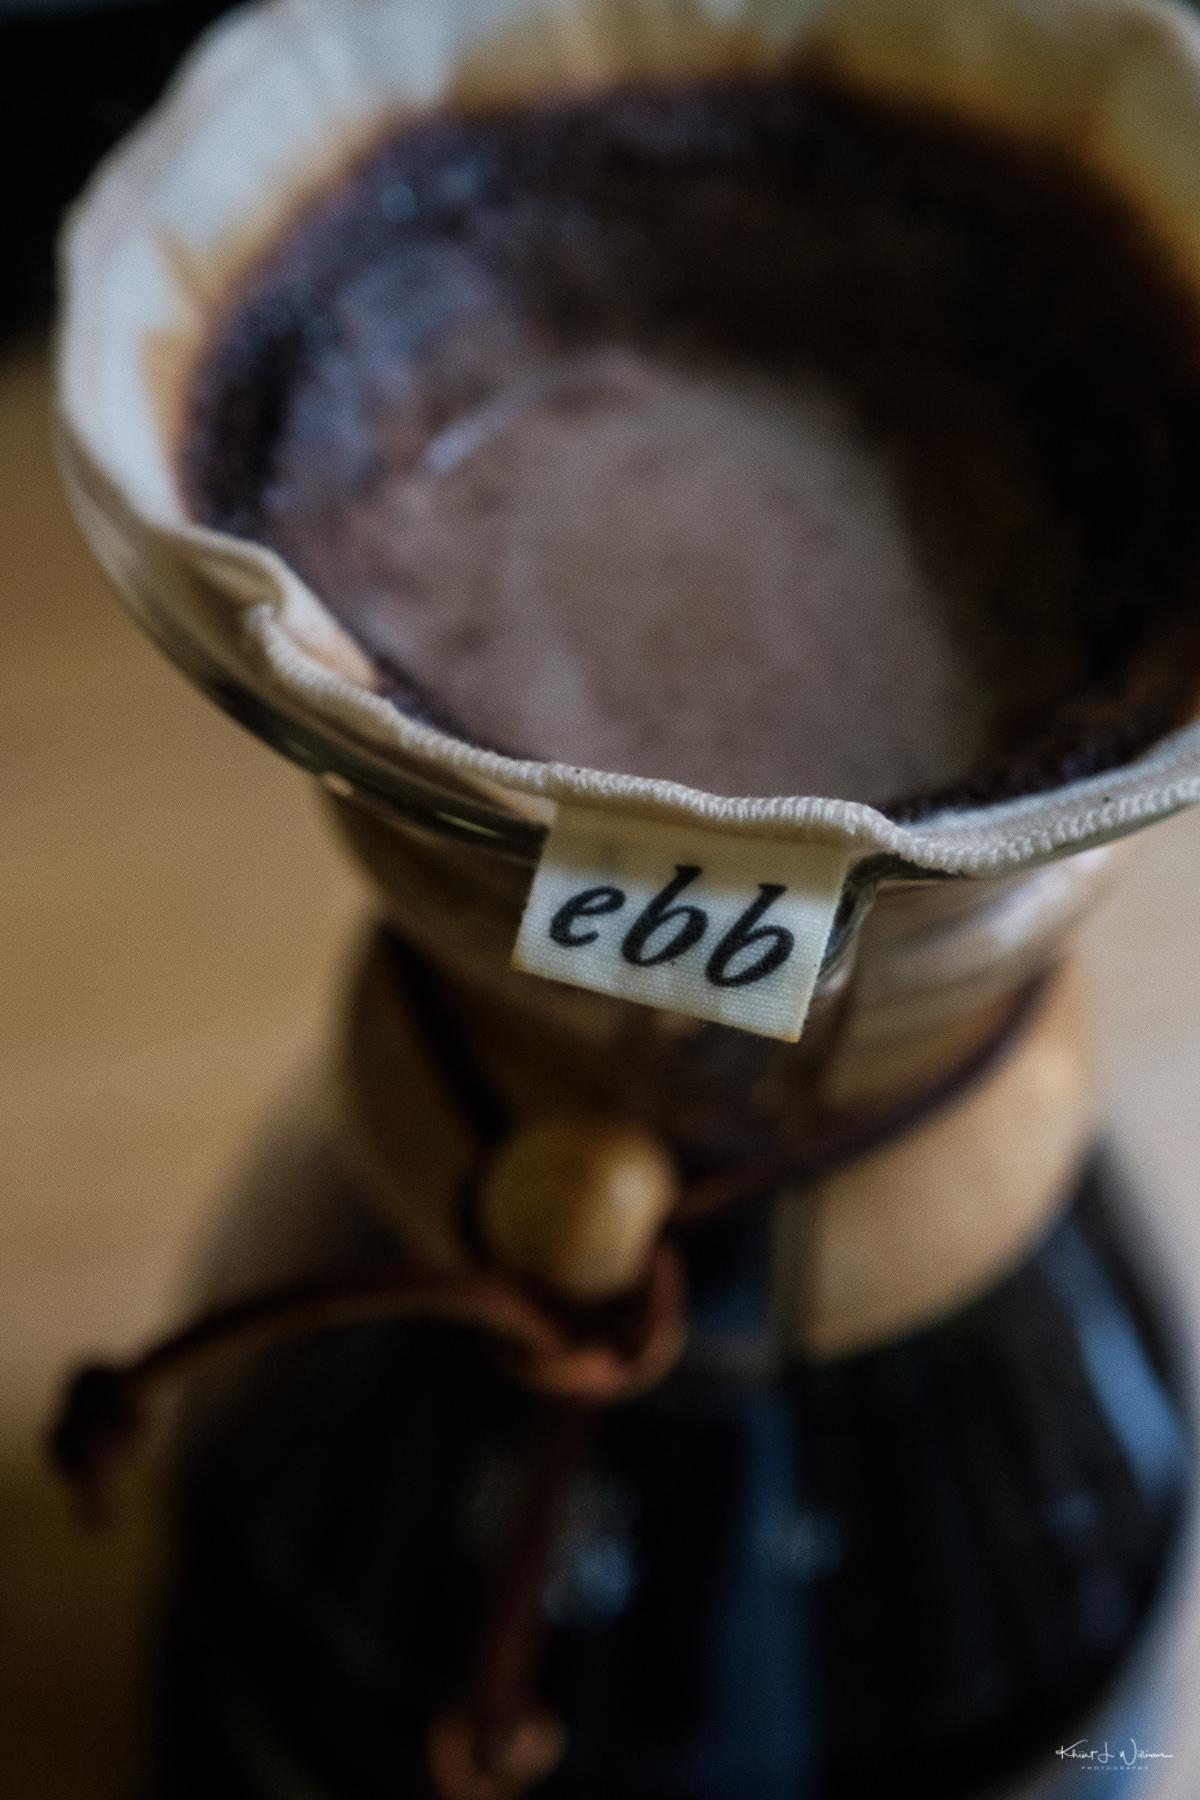 Ebb Coffee Filter for Chemex